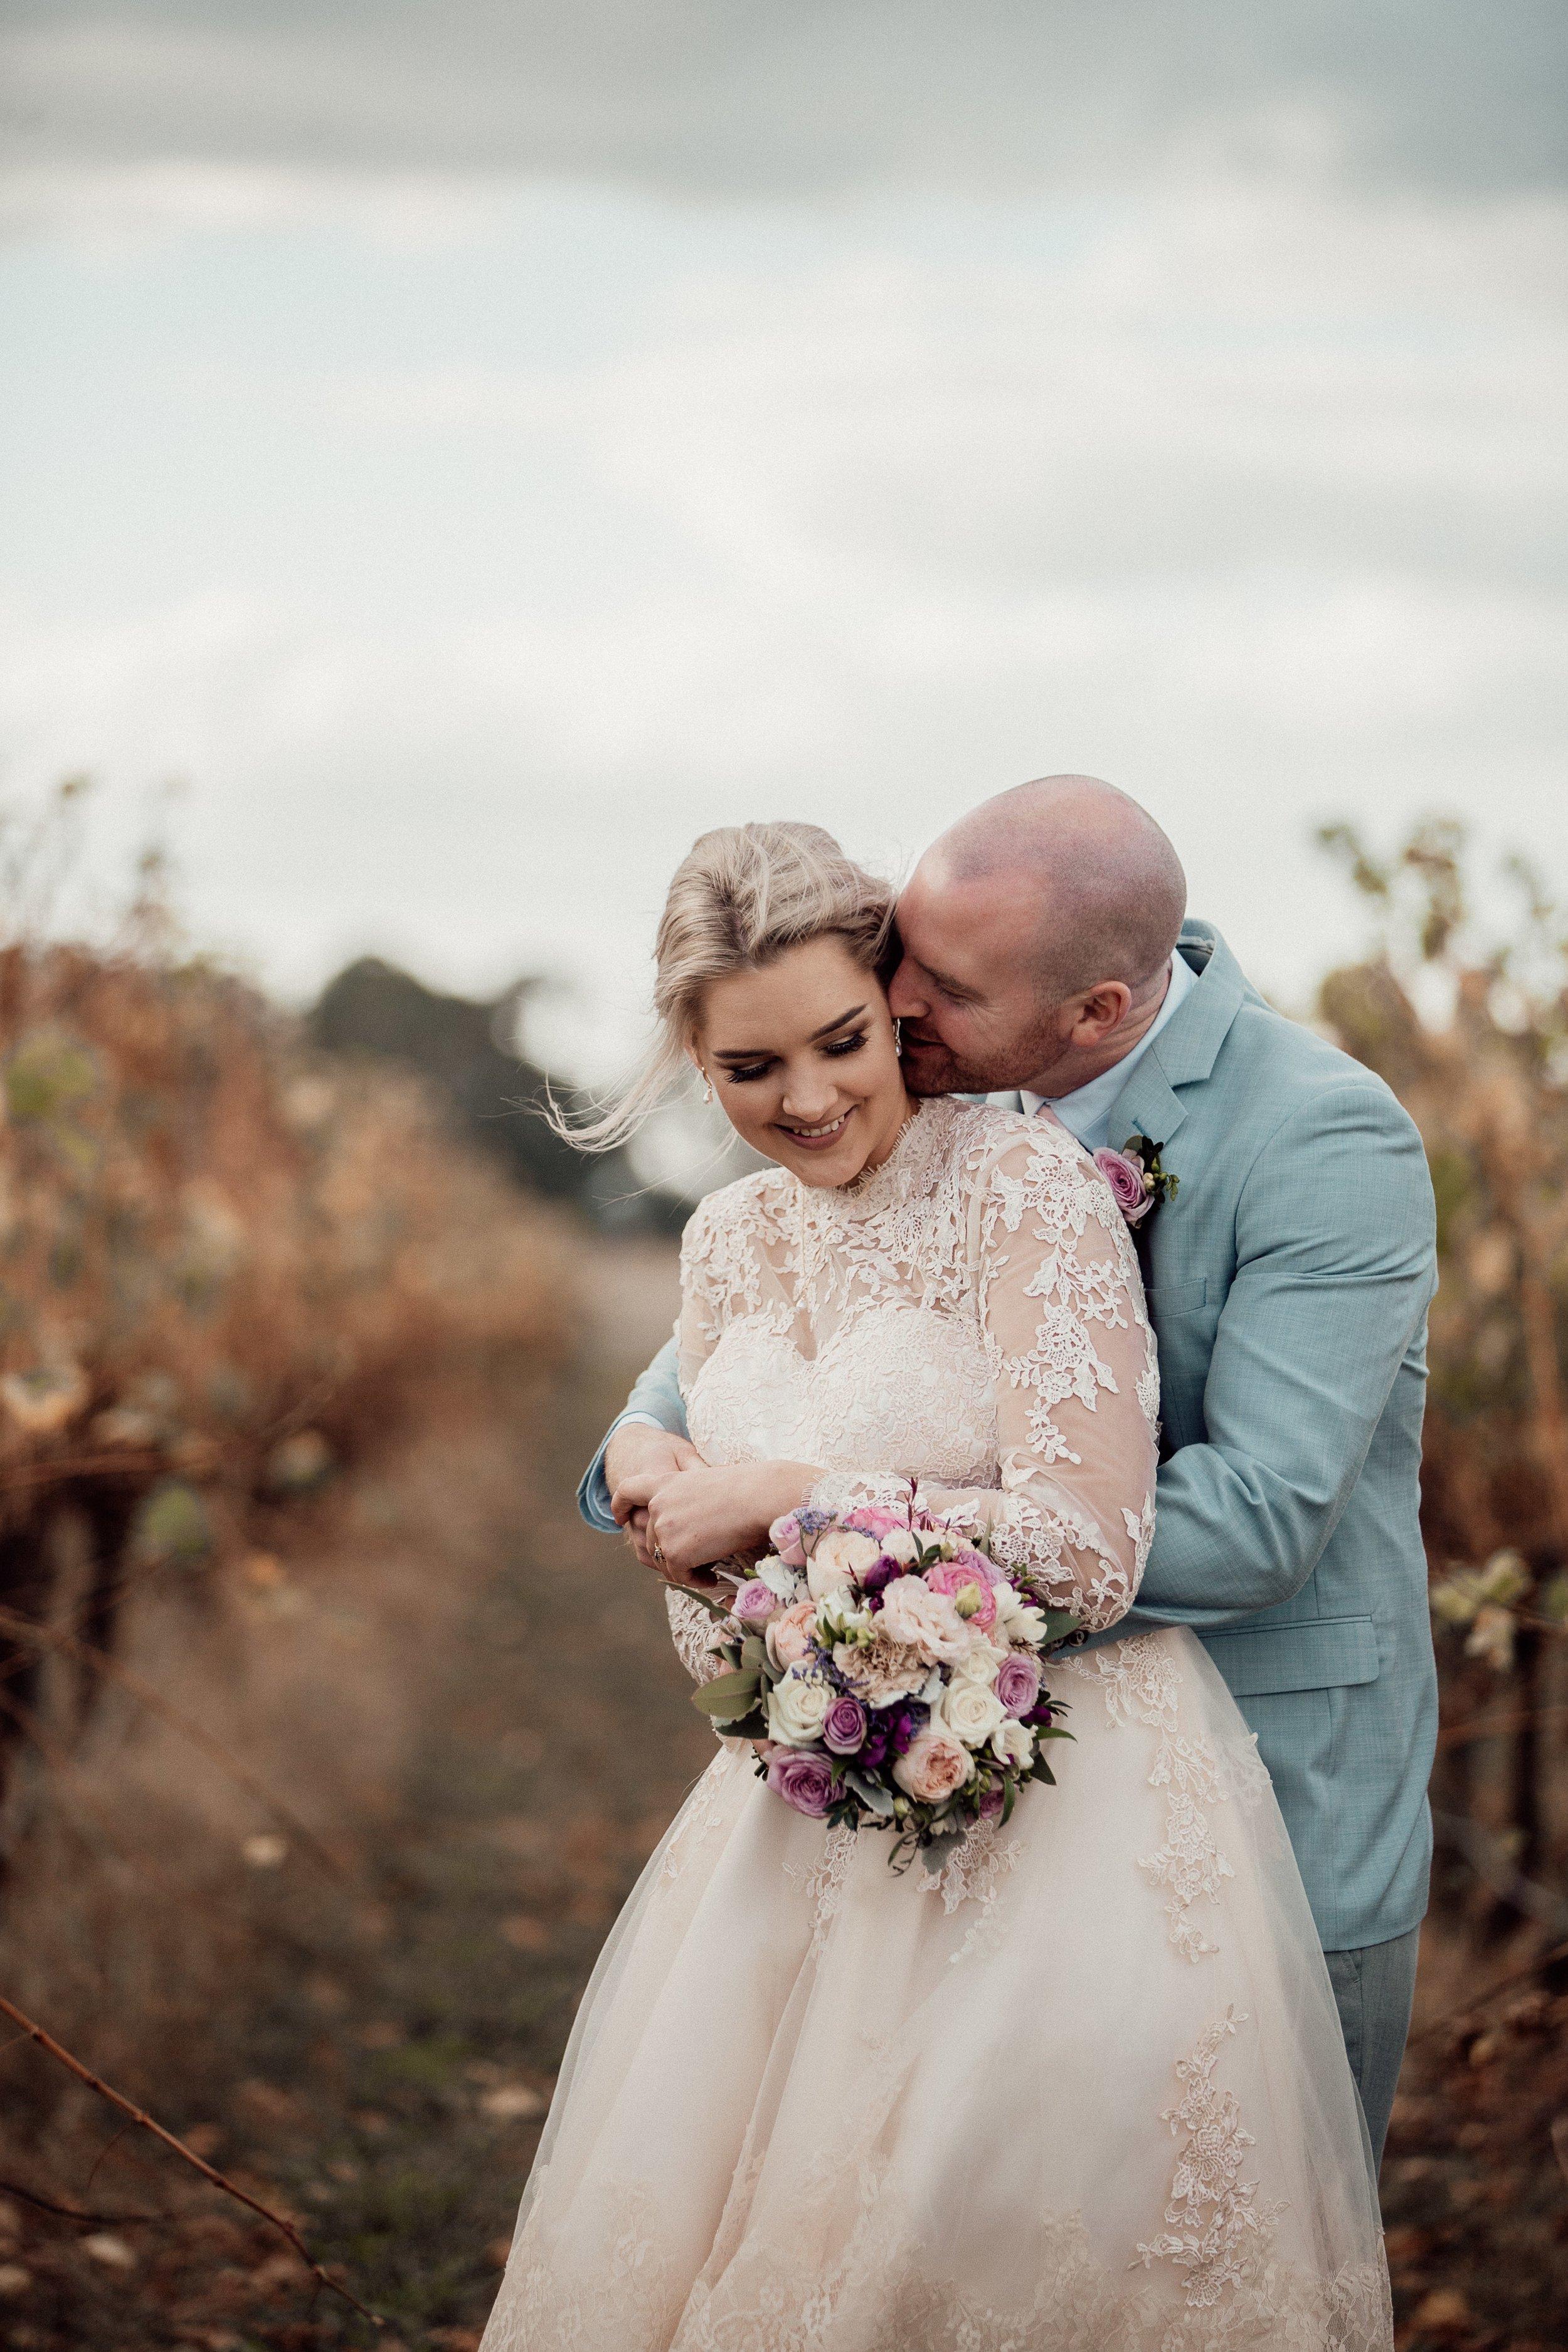 mickalathomas_puremacphotography_weddingphotographer_couplephotographer_Sheppartonphotographer_1488.jpg